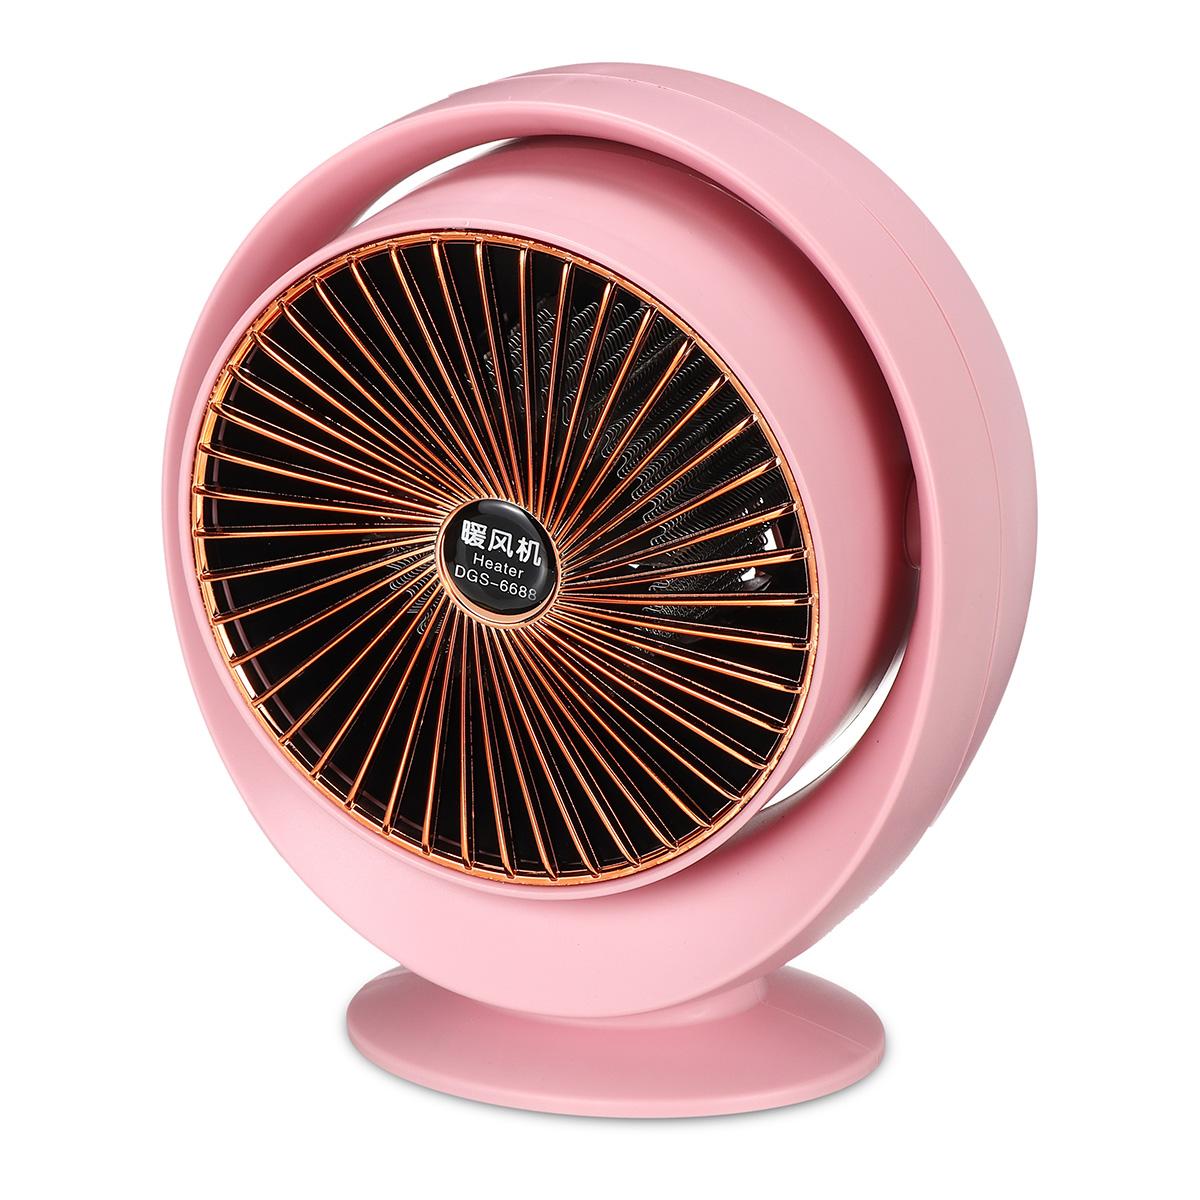 800W Mini Electric Air Heater Portable Space PTC Ceramic Heating Fan Home Office Winter Warmer